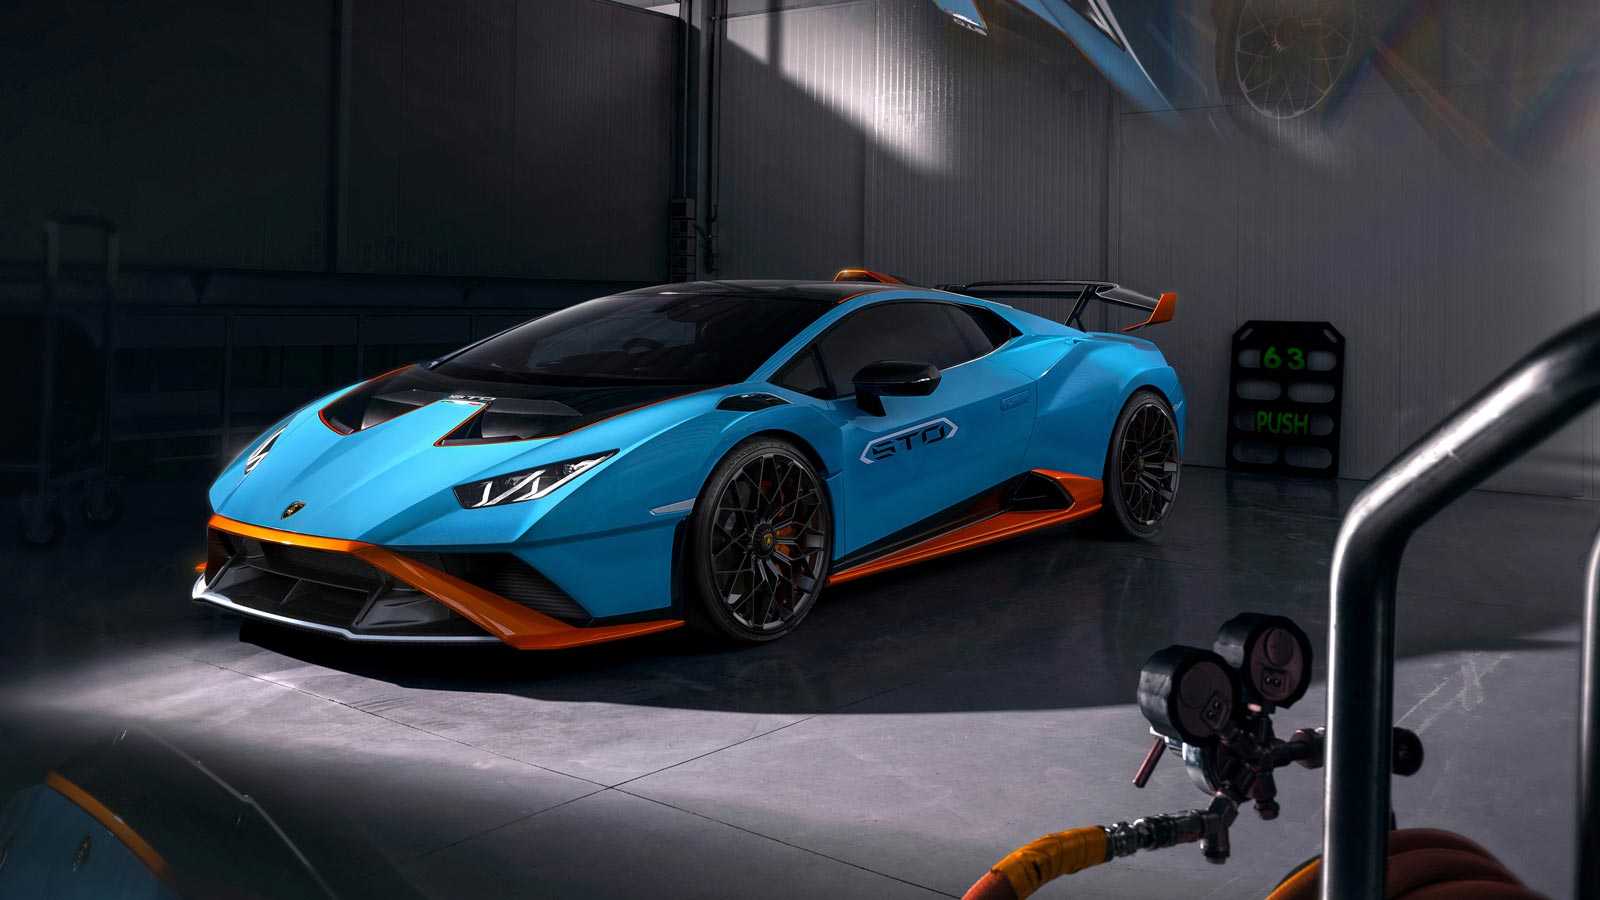 Lamborghini Huracan STO - From racetrack to road image 4